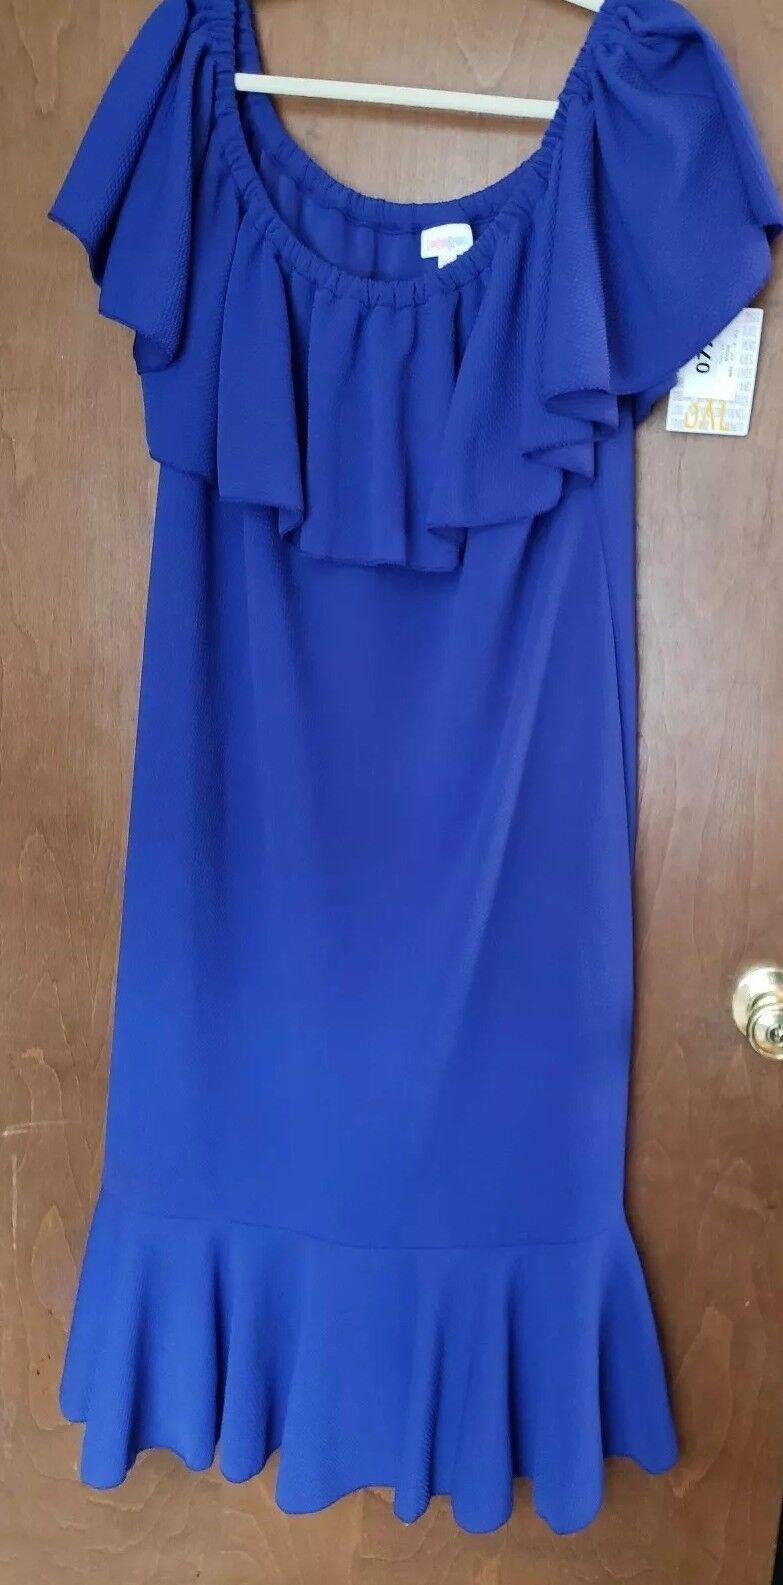 Lularoe Cici Flounce Dress 3XL XXXL Solid bluee